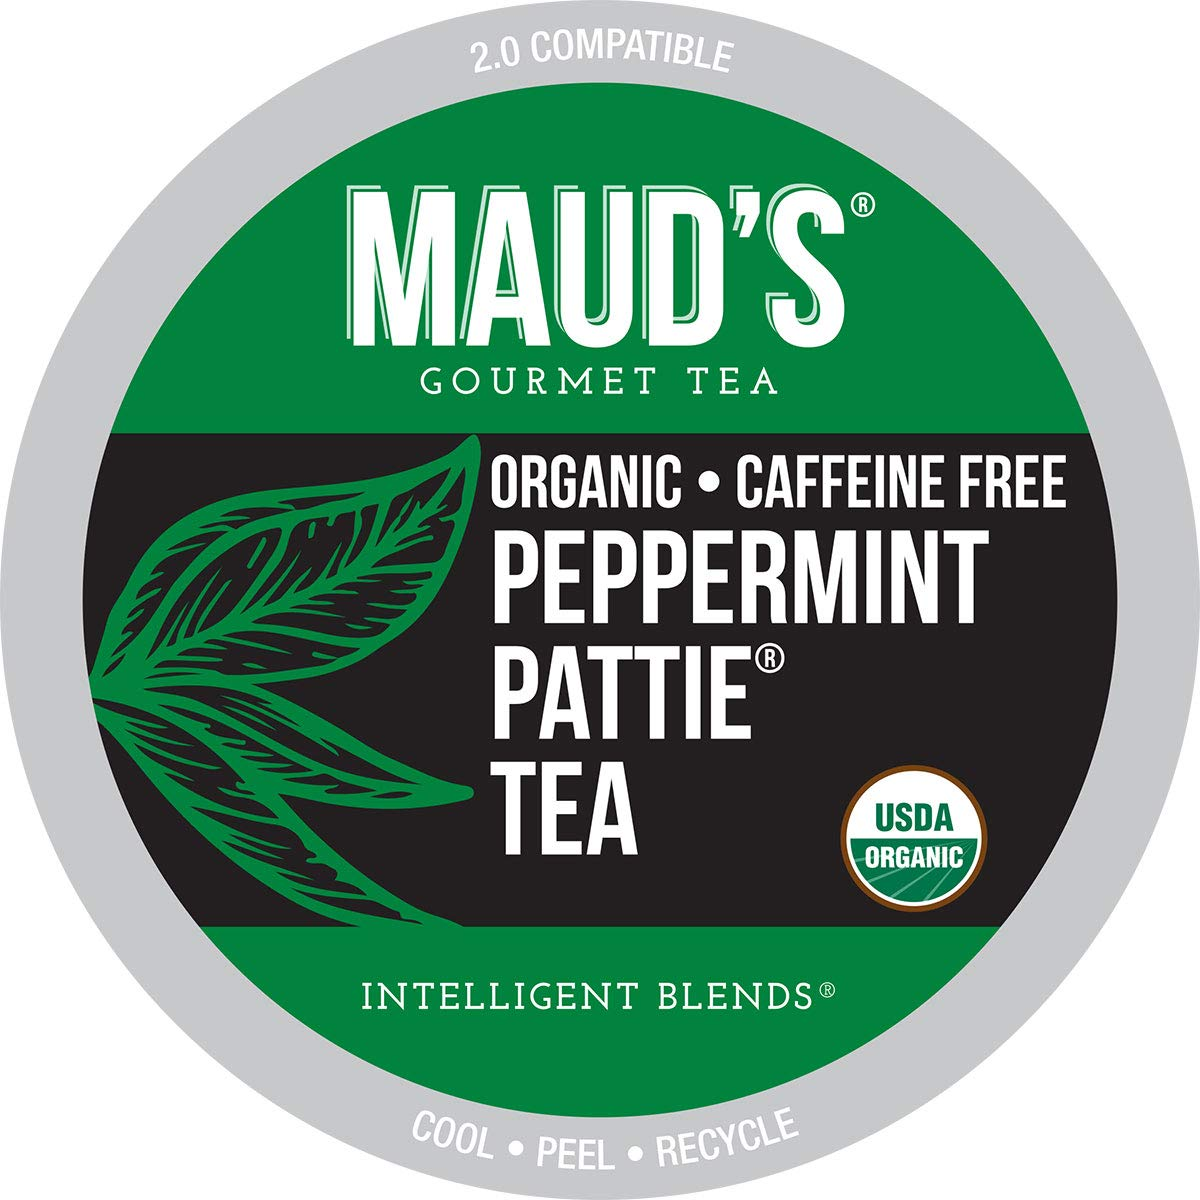 Maud's Organic Peppermint Tea (Peppermint Pattie Tea), 24ct. Recyclable Single Serve Organic Decaf Tea Pods – 100% Organic Caffeine Free Herbal Tea California Blended, Keurig Mint Tea K Cup Compatible